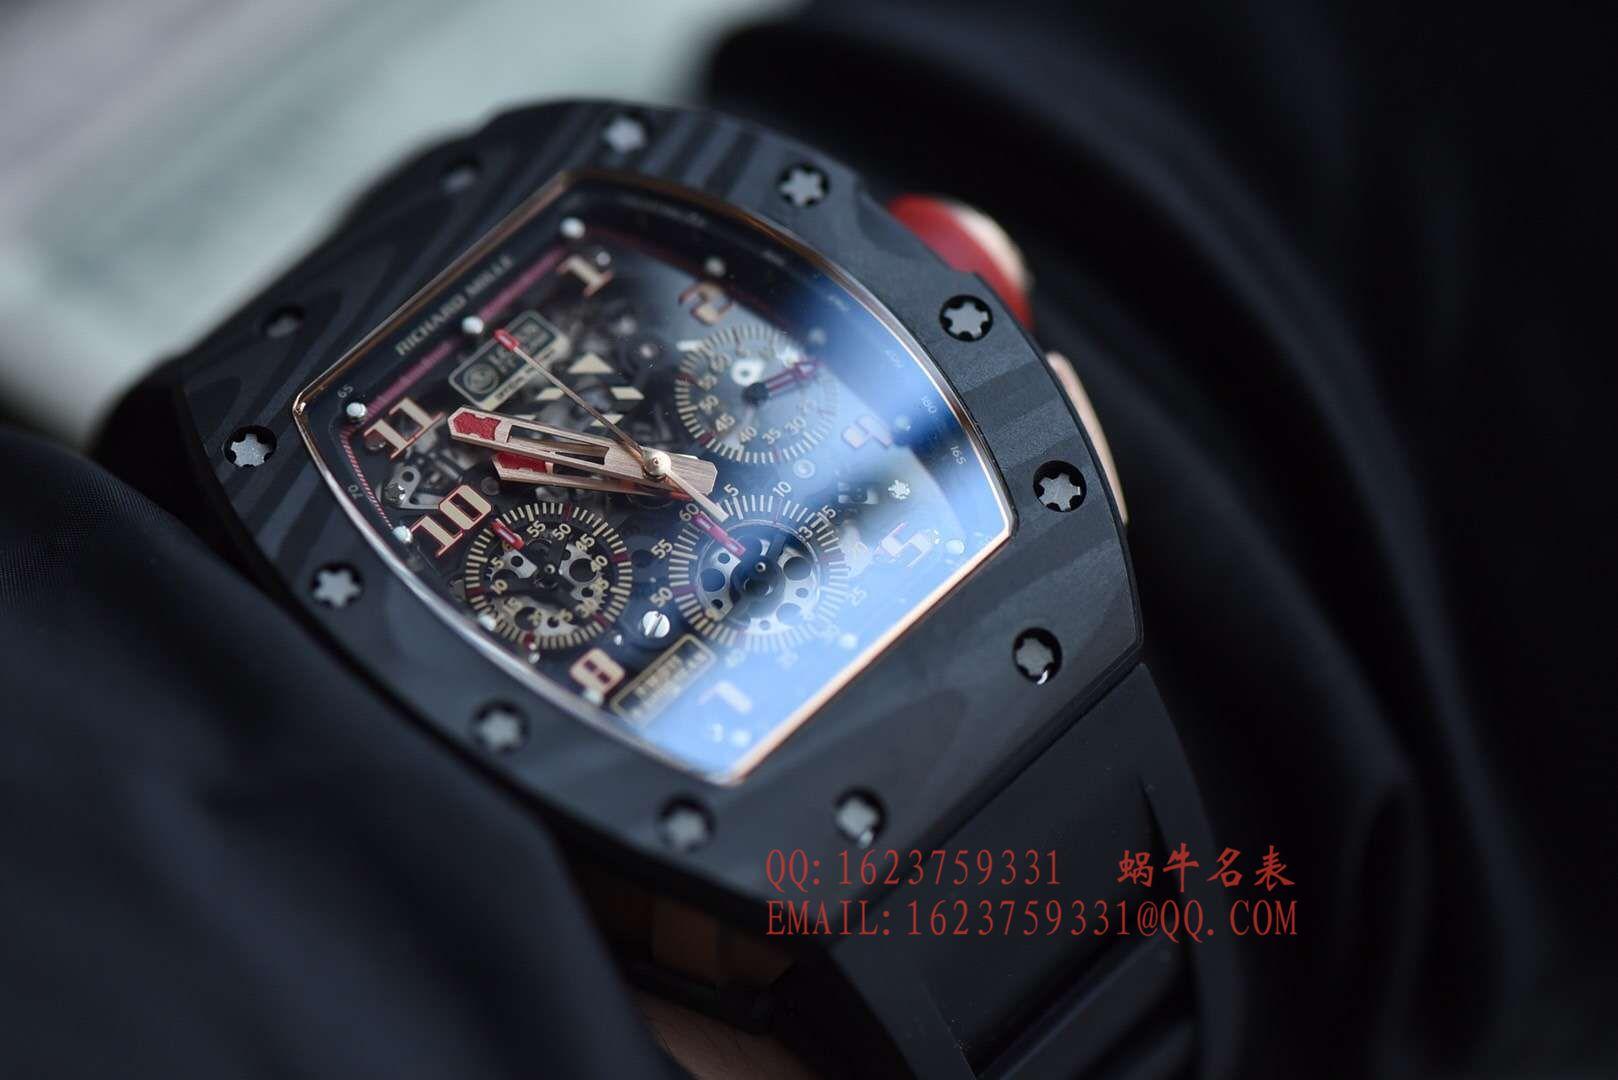 【KV厂一比一超A高仿手表】理查德.米勒RICHARD MILLE男士系列RM 011 LOTUS F1 TEAM男士机械腕表 / RM 011 LOTUS F1 TEAM